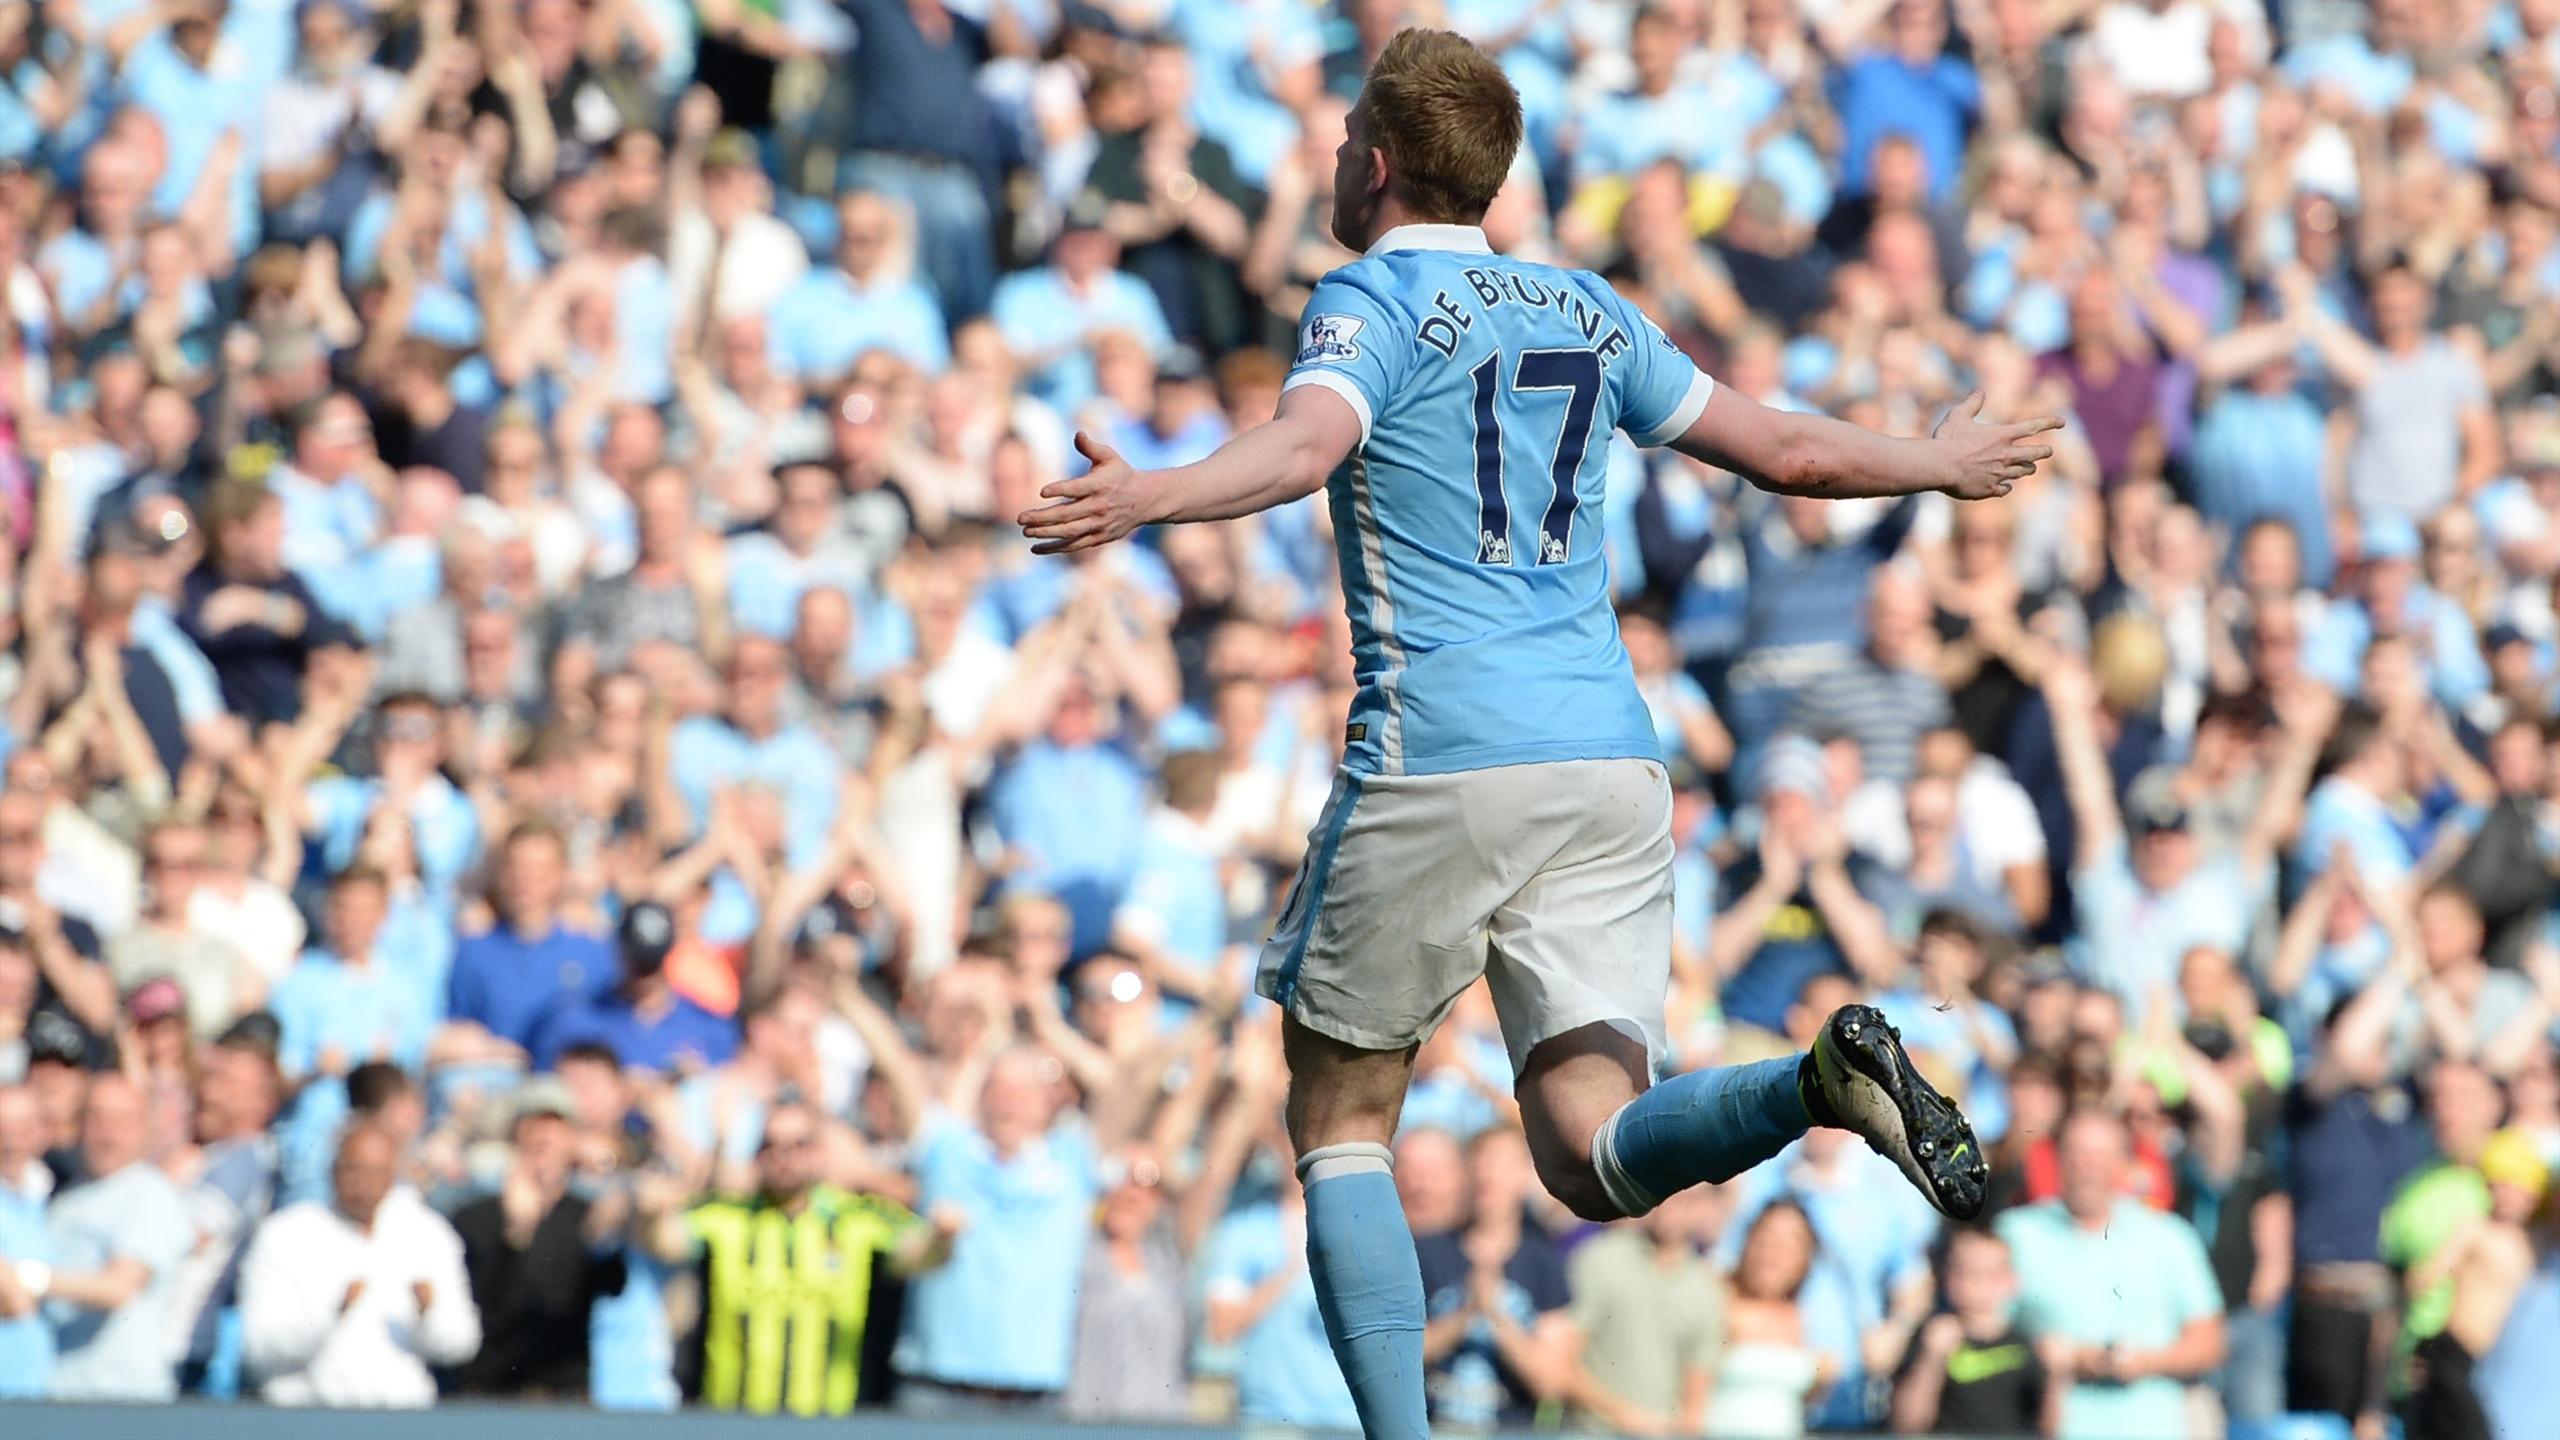 Manchester City's Belgian midfielder Kevin De Bruyne celebrates after scoring